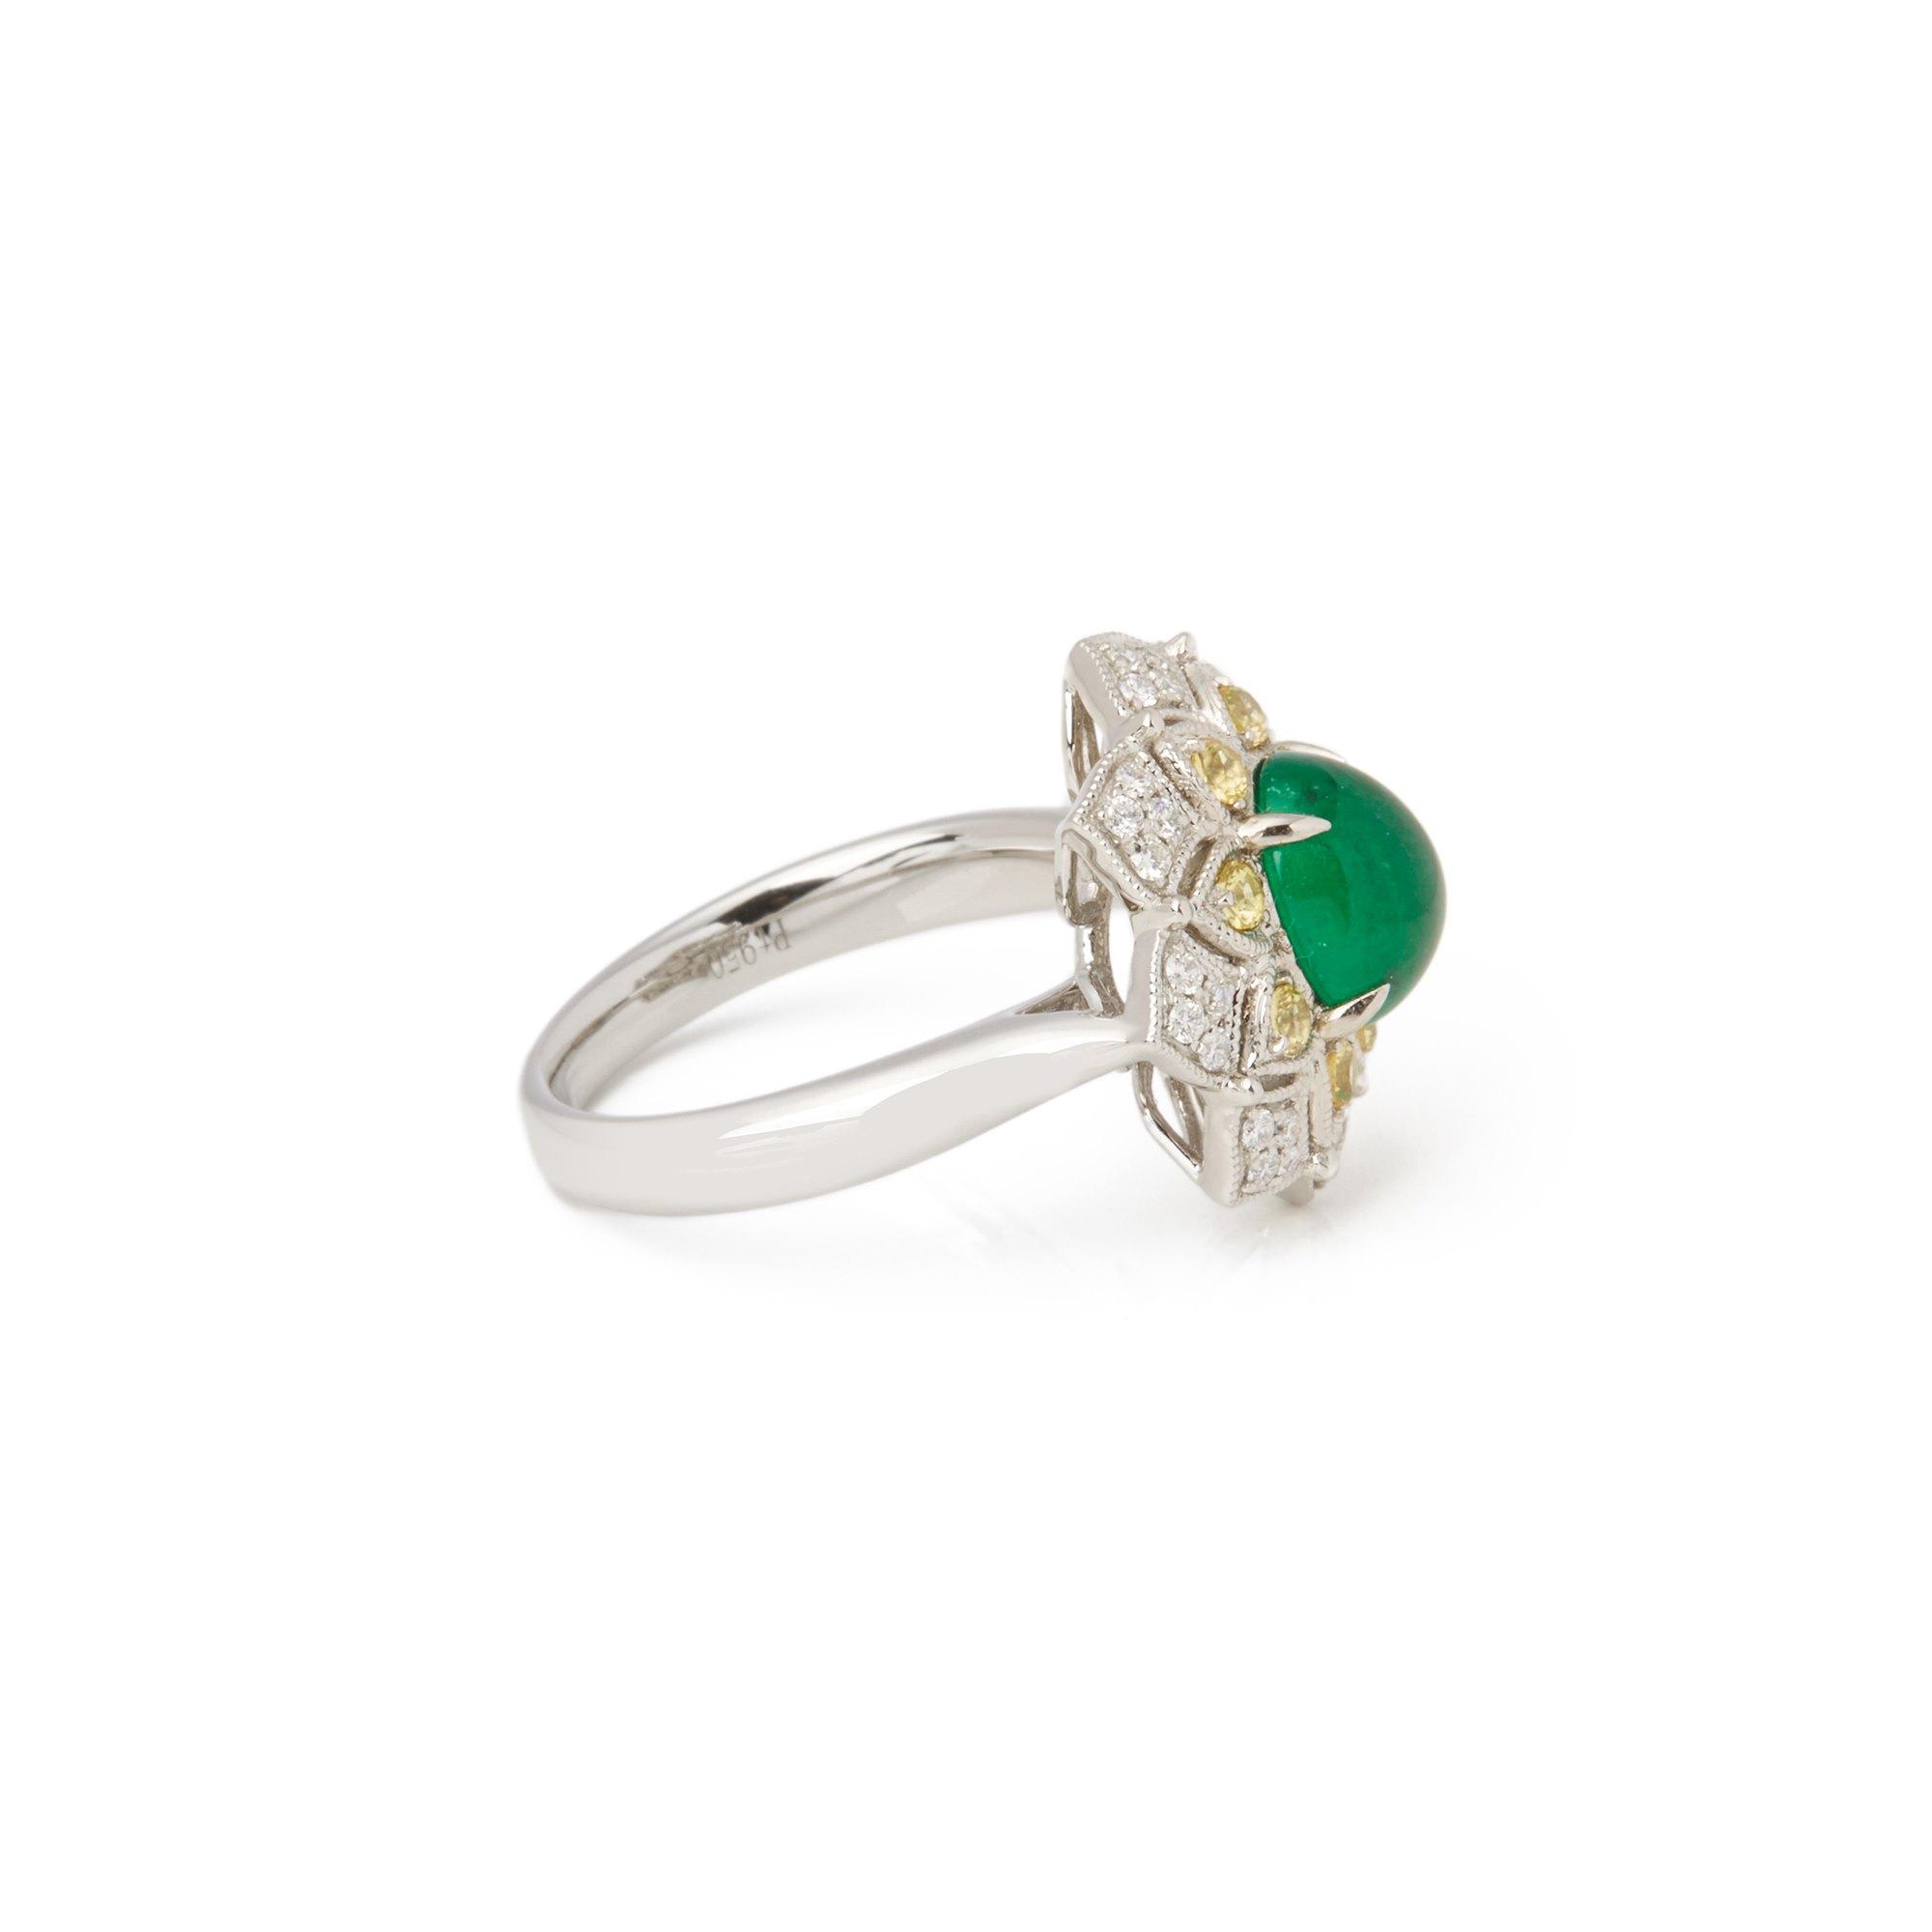 David Jerome Platinum Emerald, Diamond and yellow Sapphire Cluster Ring